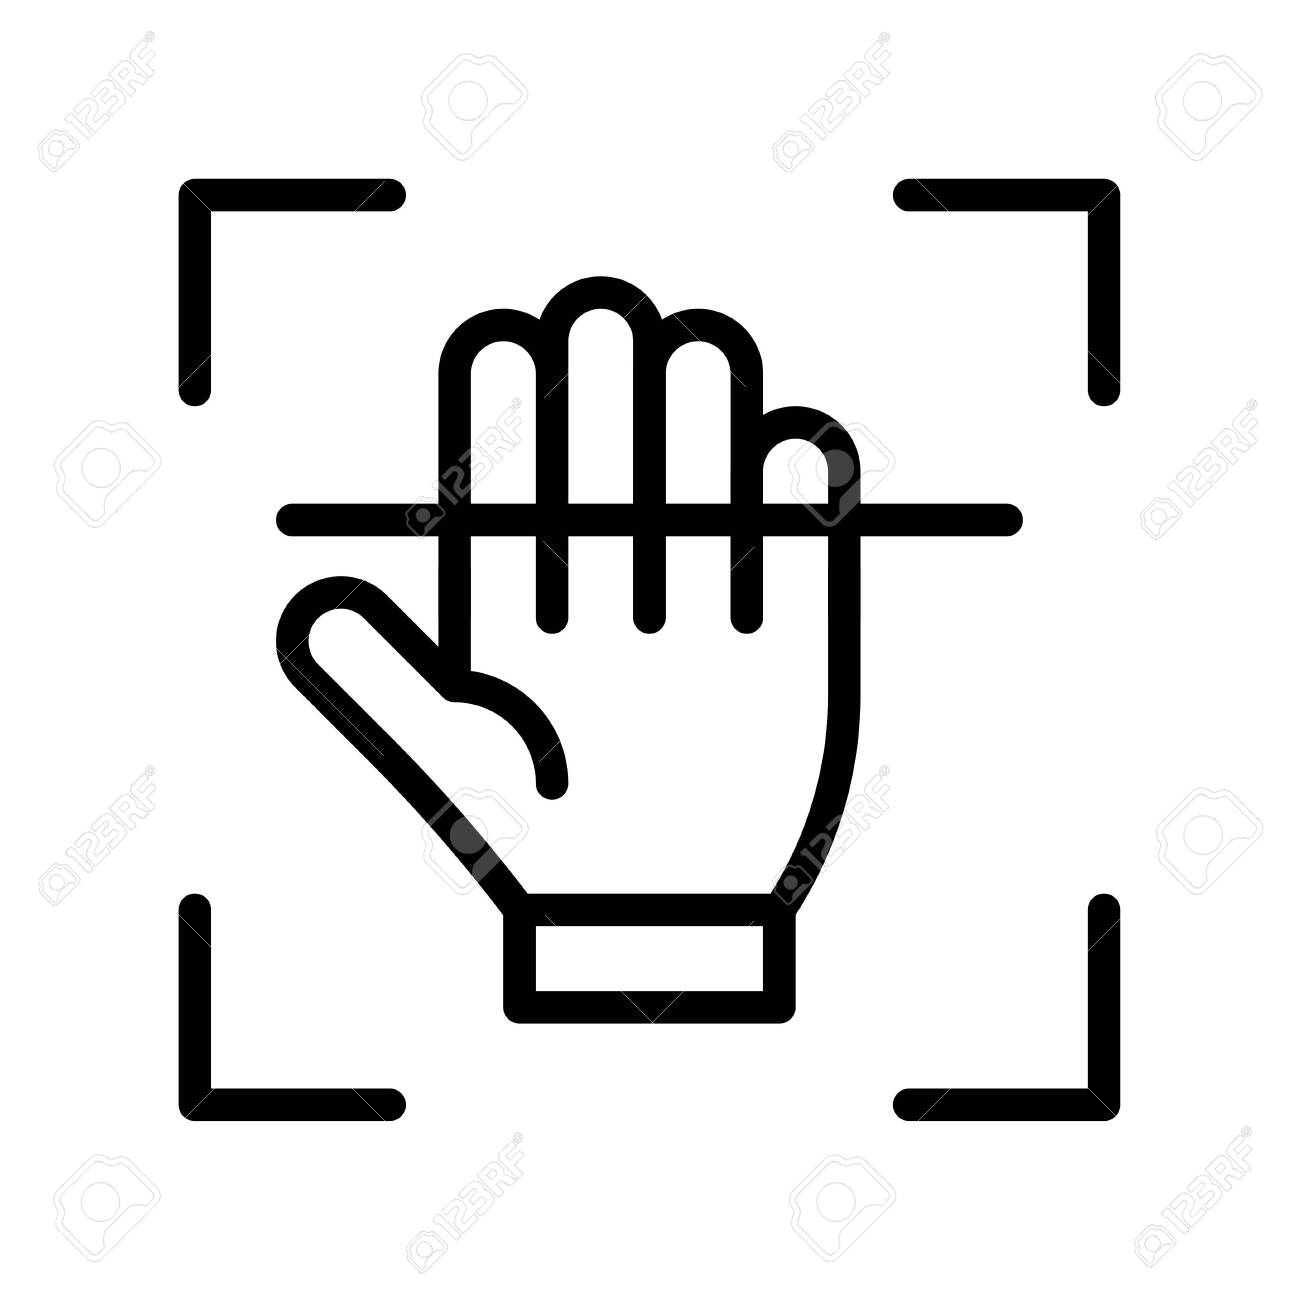 Electronic fingerprint recognition vector illustration, Future technology line design icon - 136139979